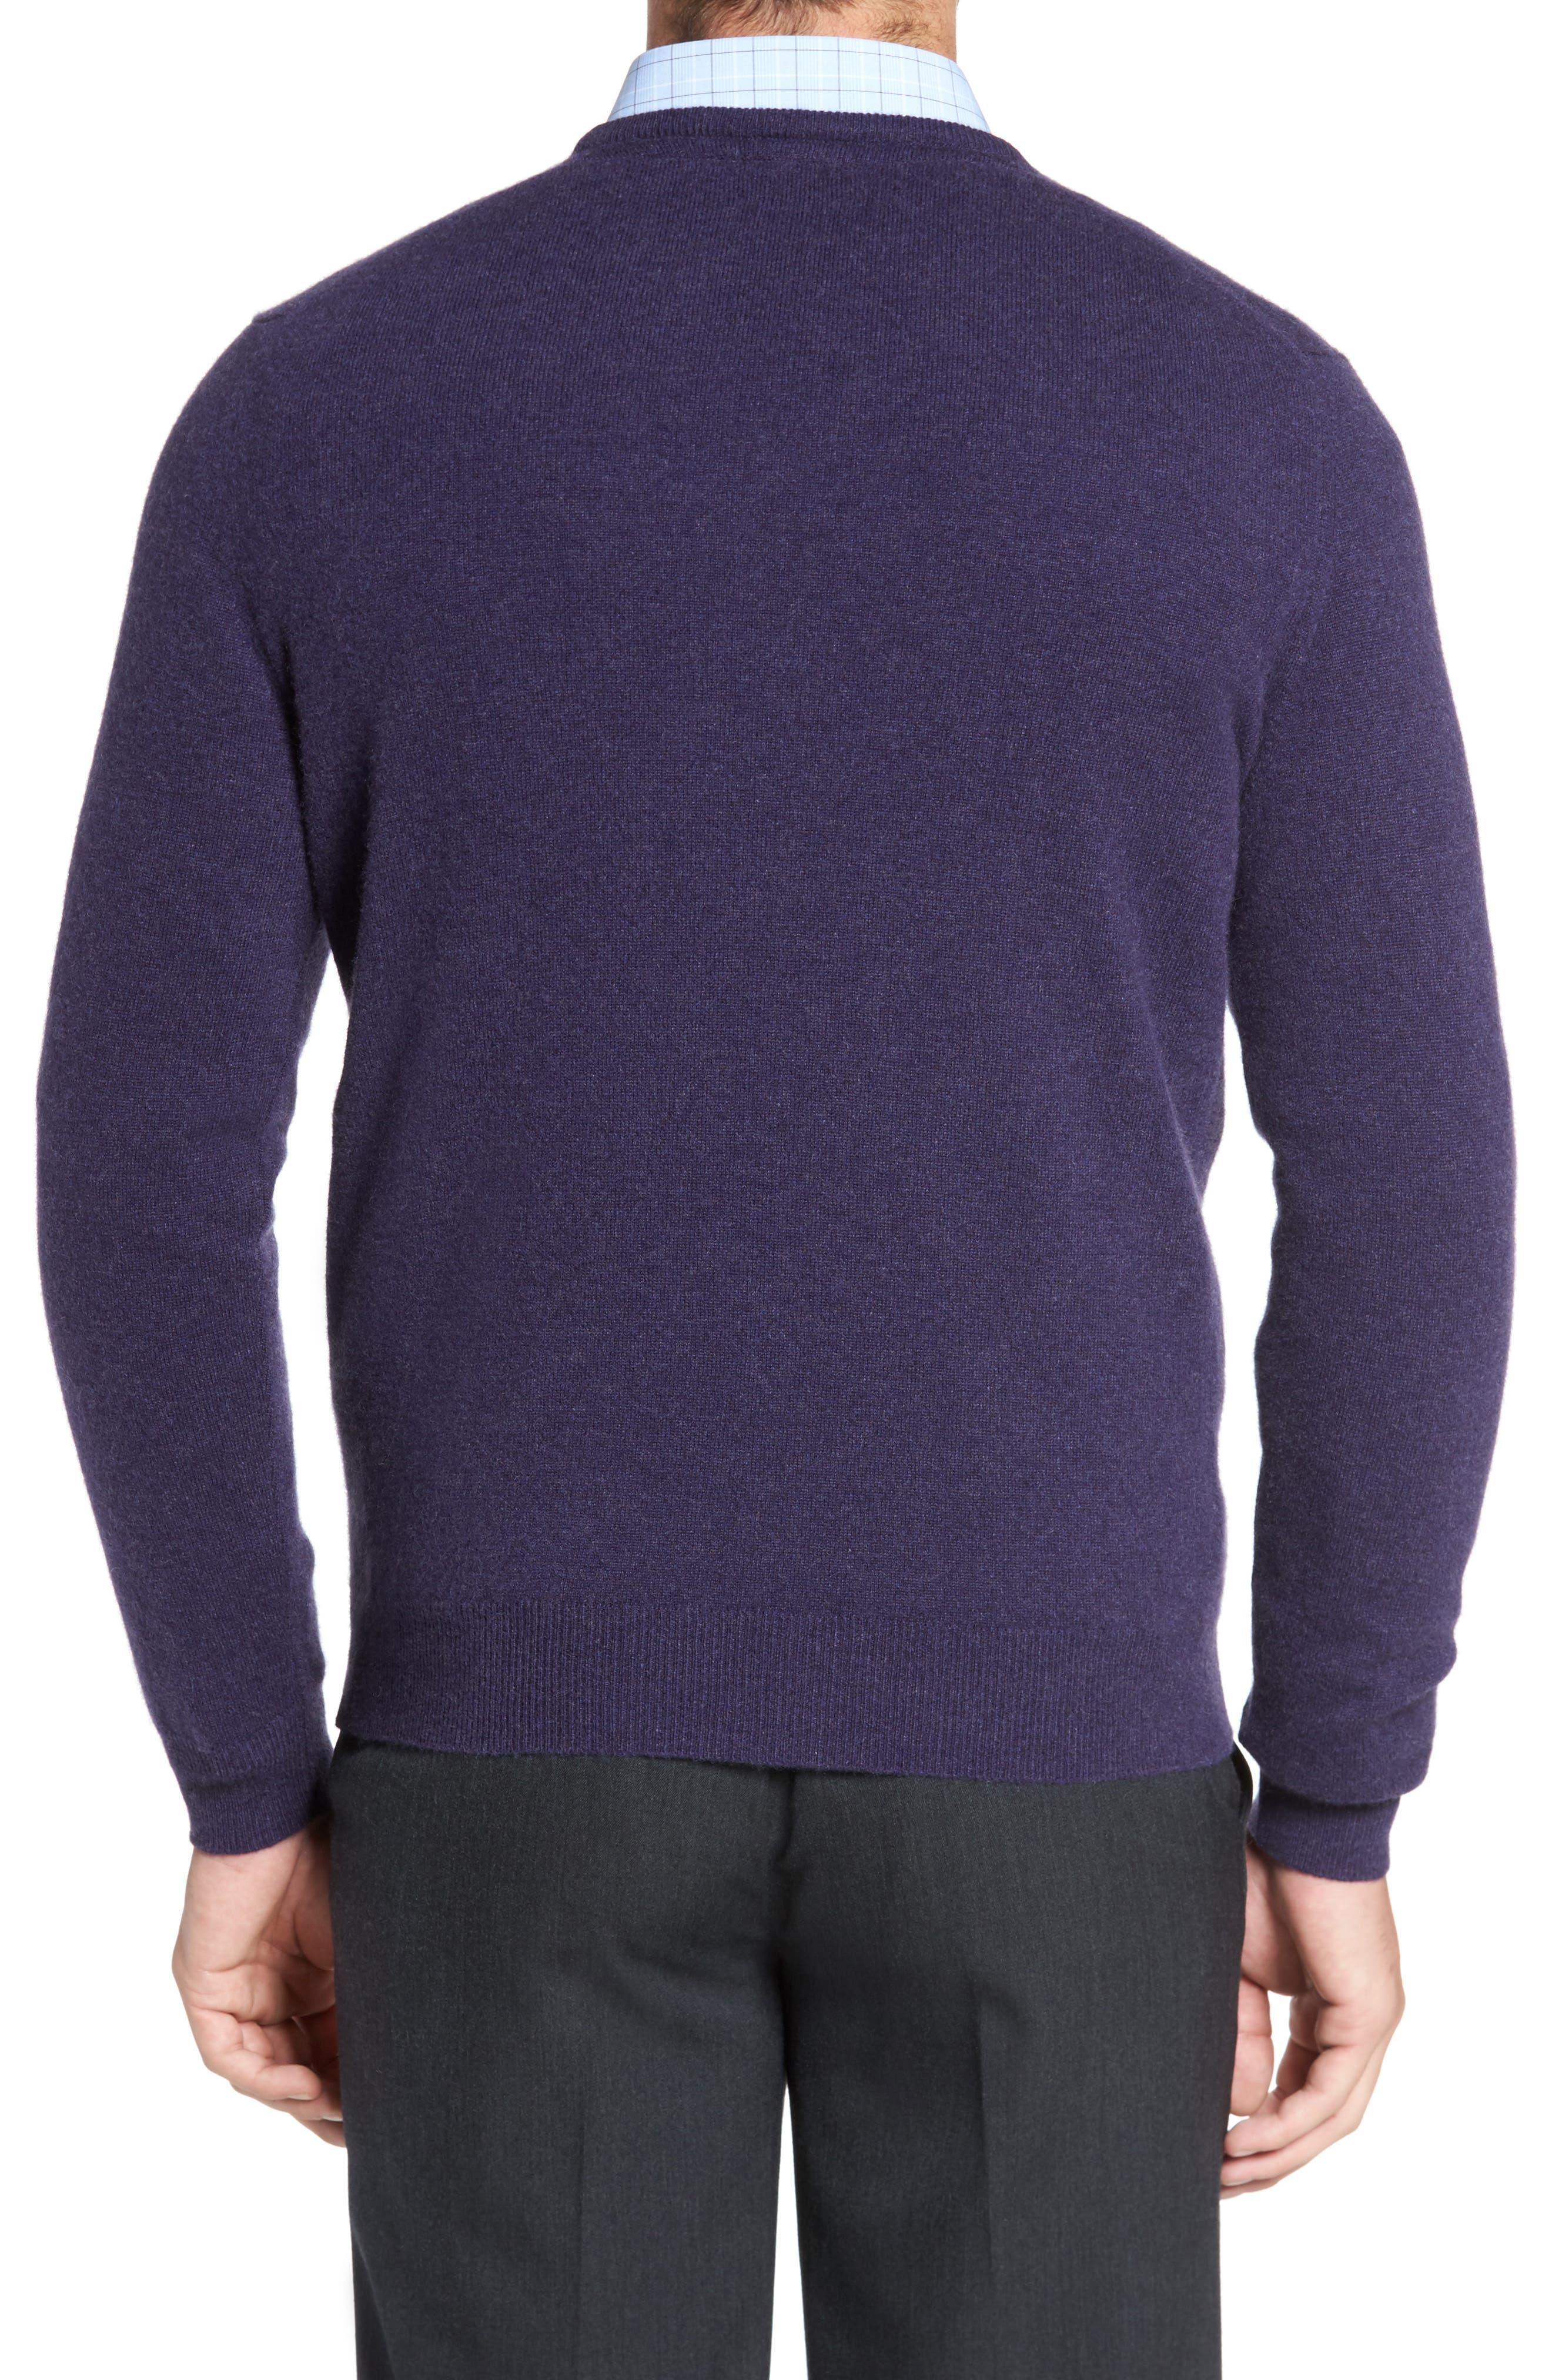 Cashmere V-Neck Sweater,                             Alternate thumbnail 11, color,